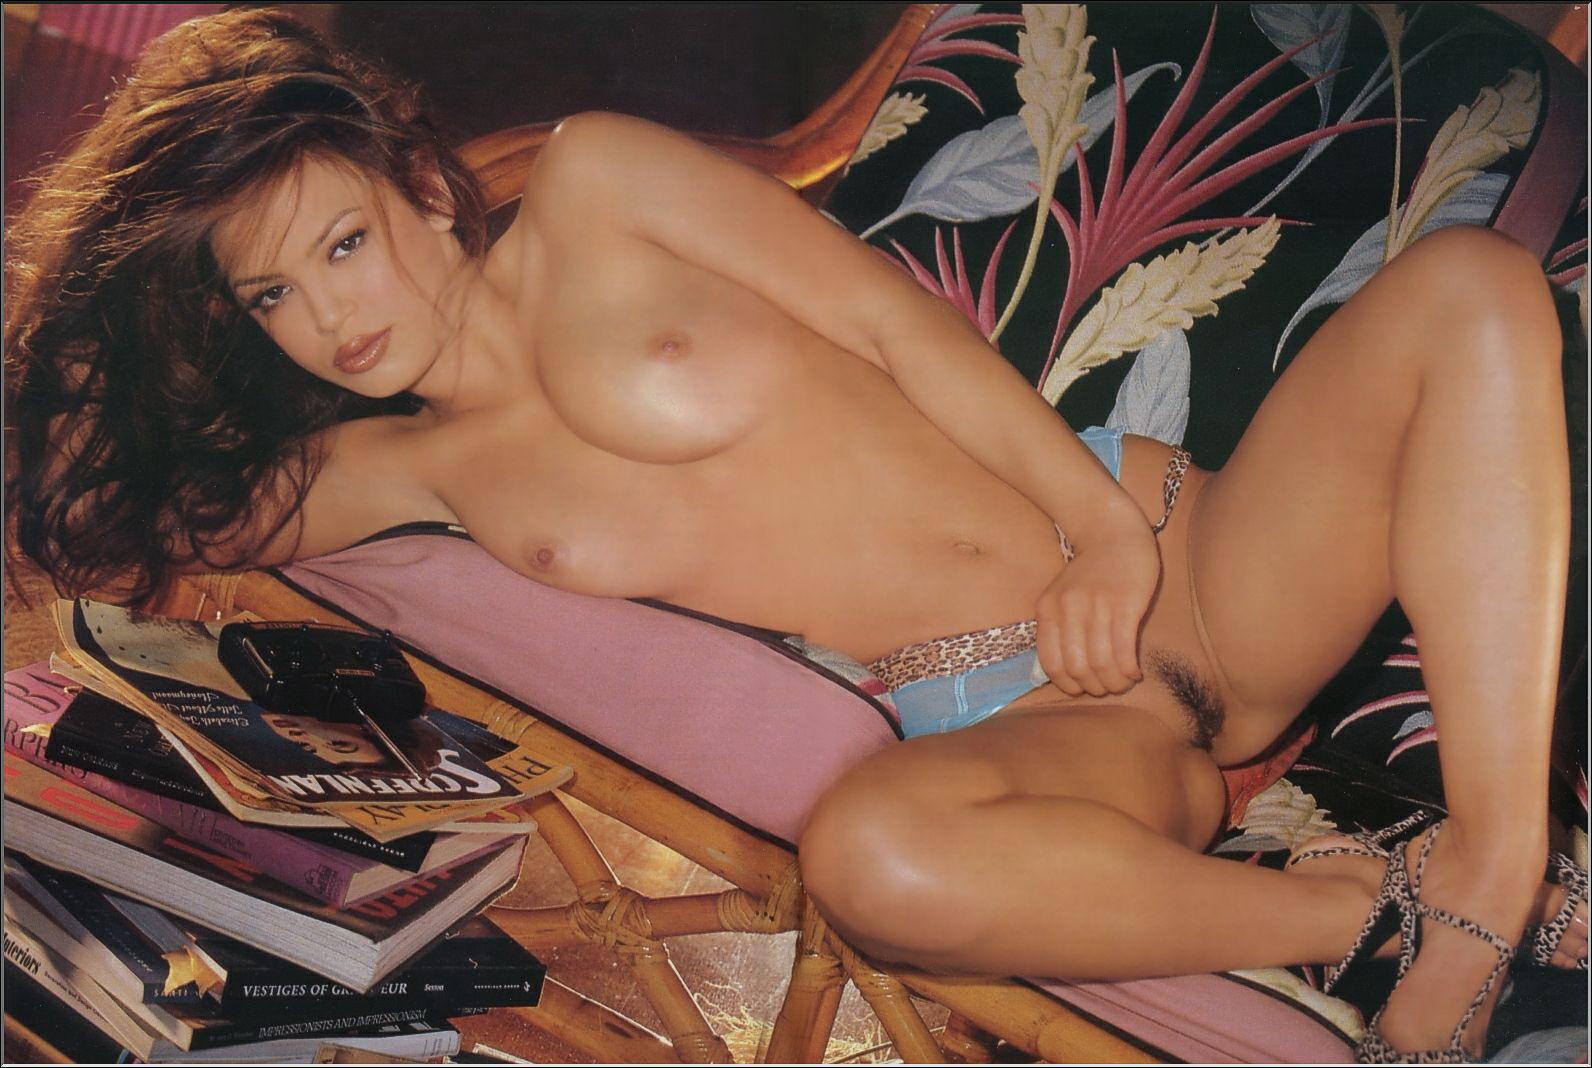 Фото эротика 90 х годов 20 фотография